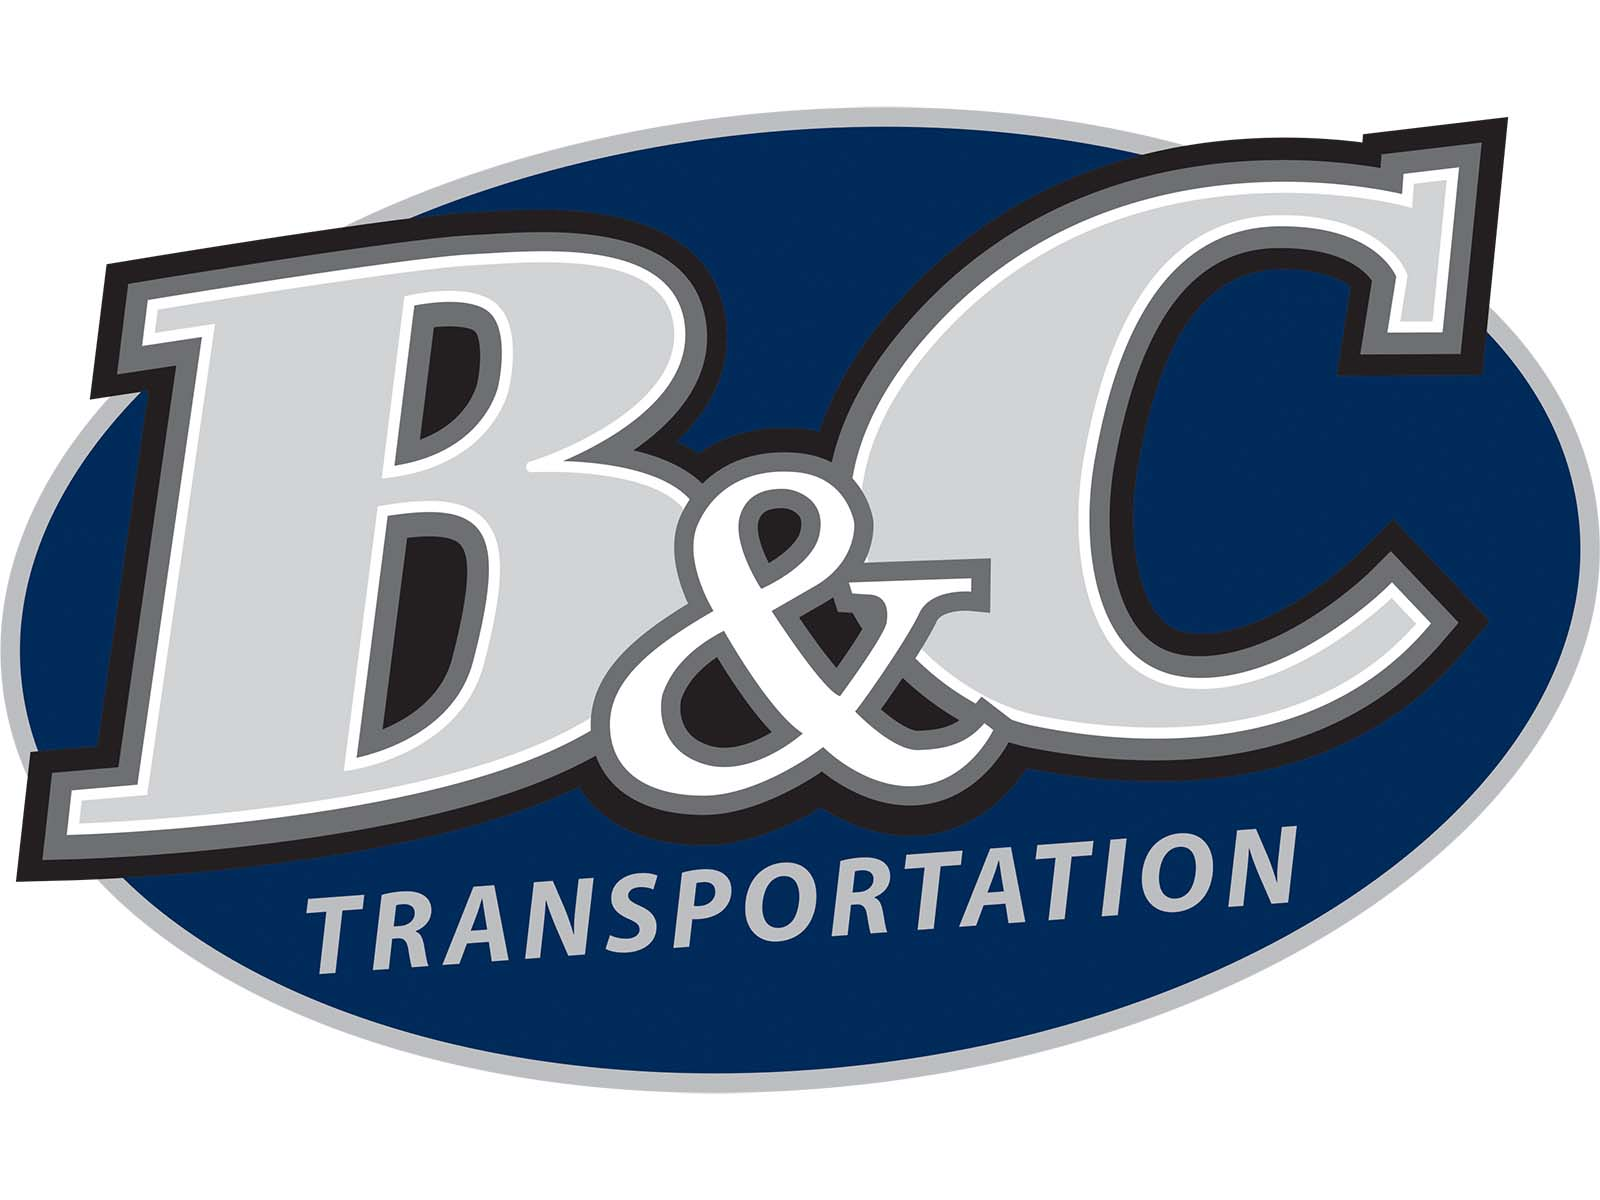 B&C Transportation Logo